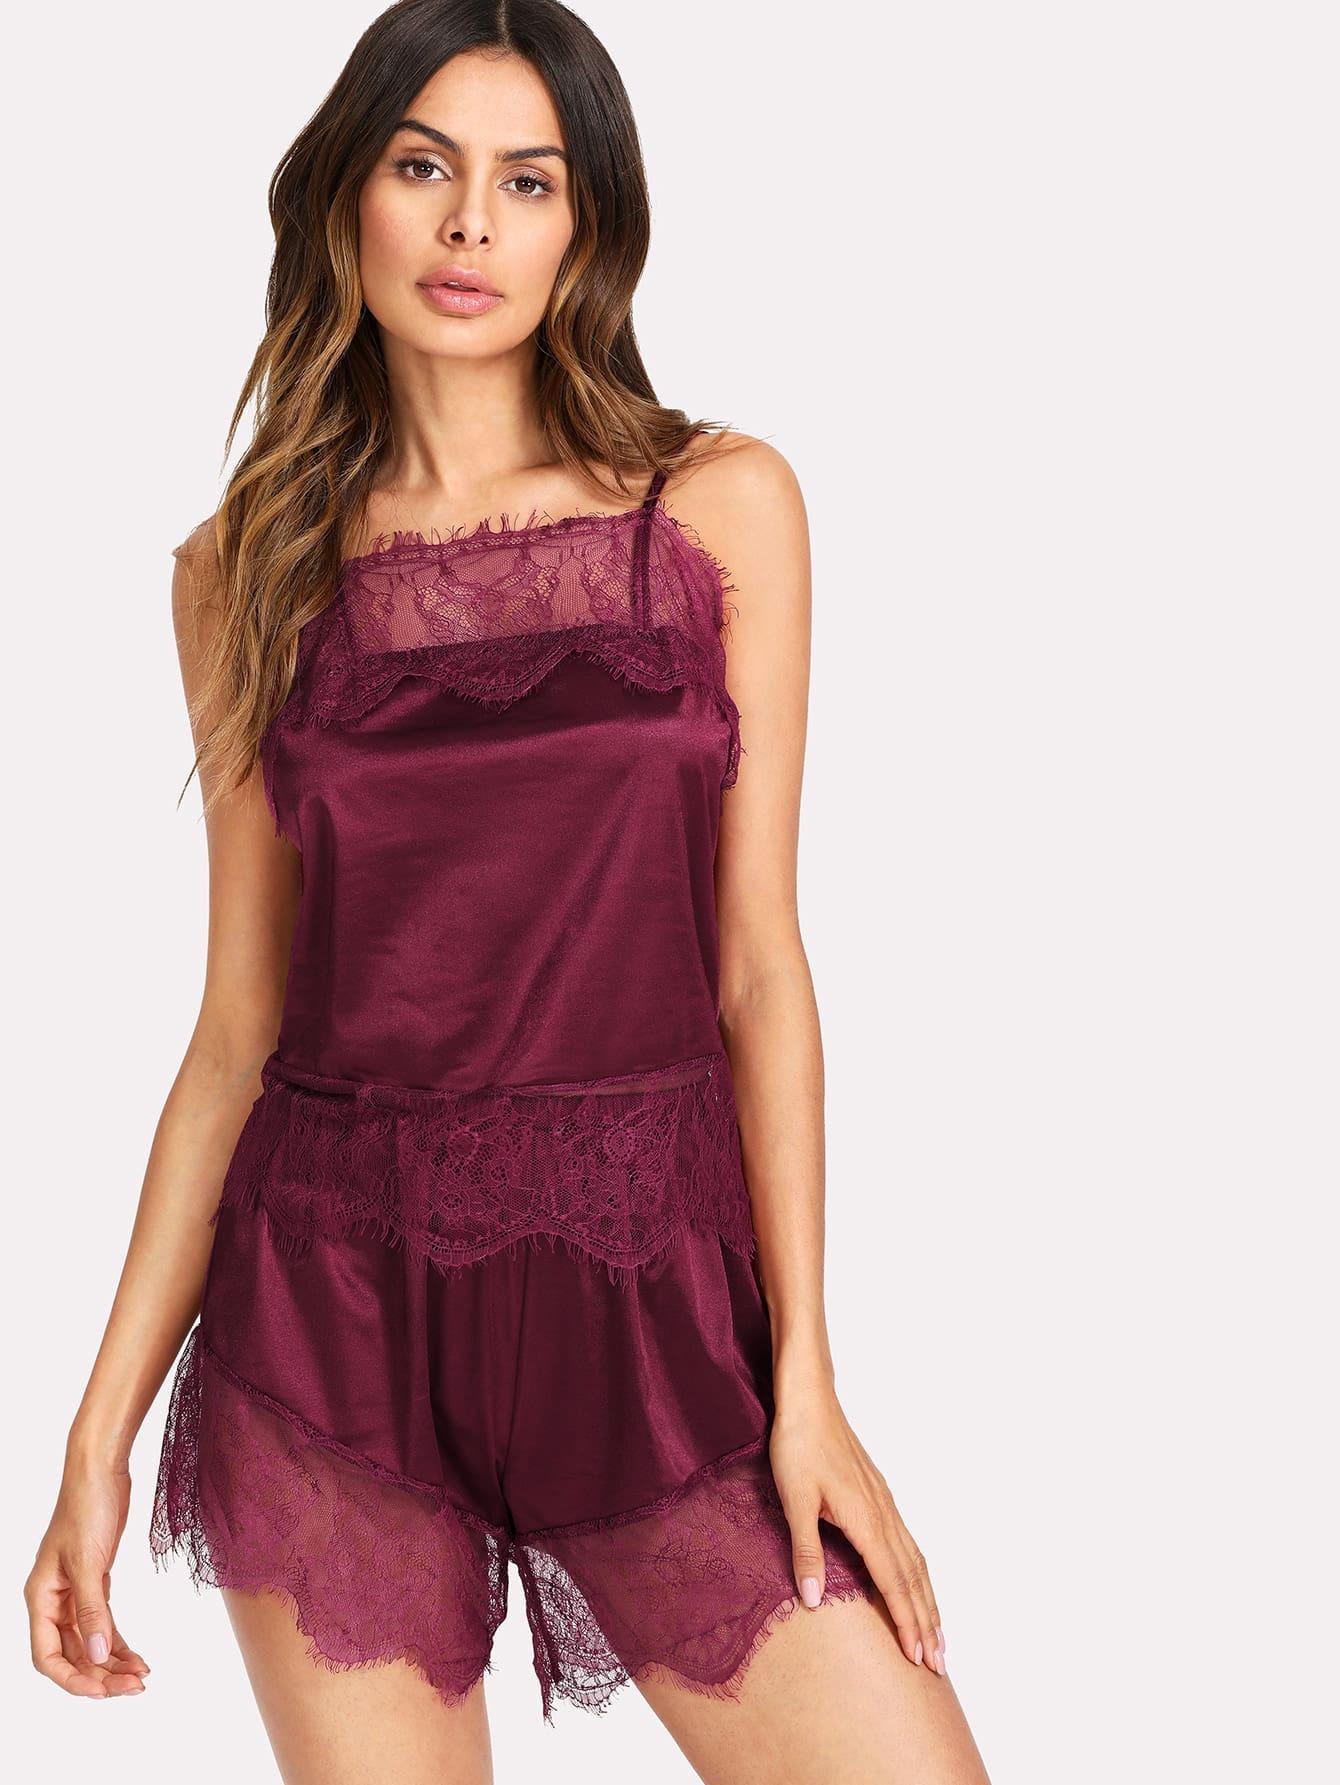 Lace Trim Satin Cami  & Shorts PJ Set lace trim satin cami and shorts pajama set